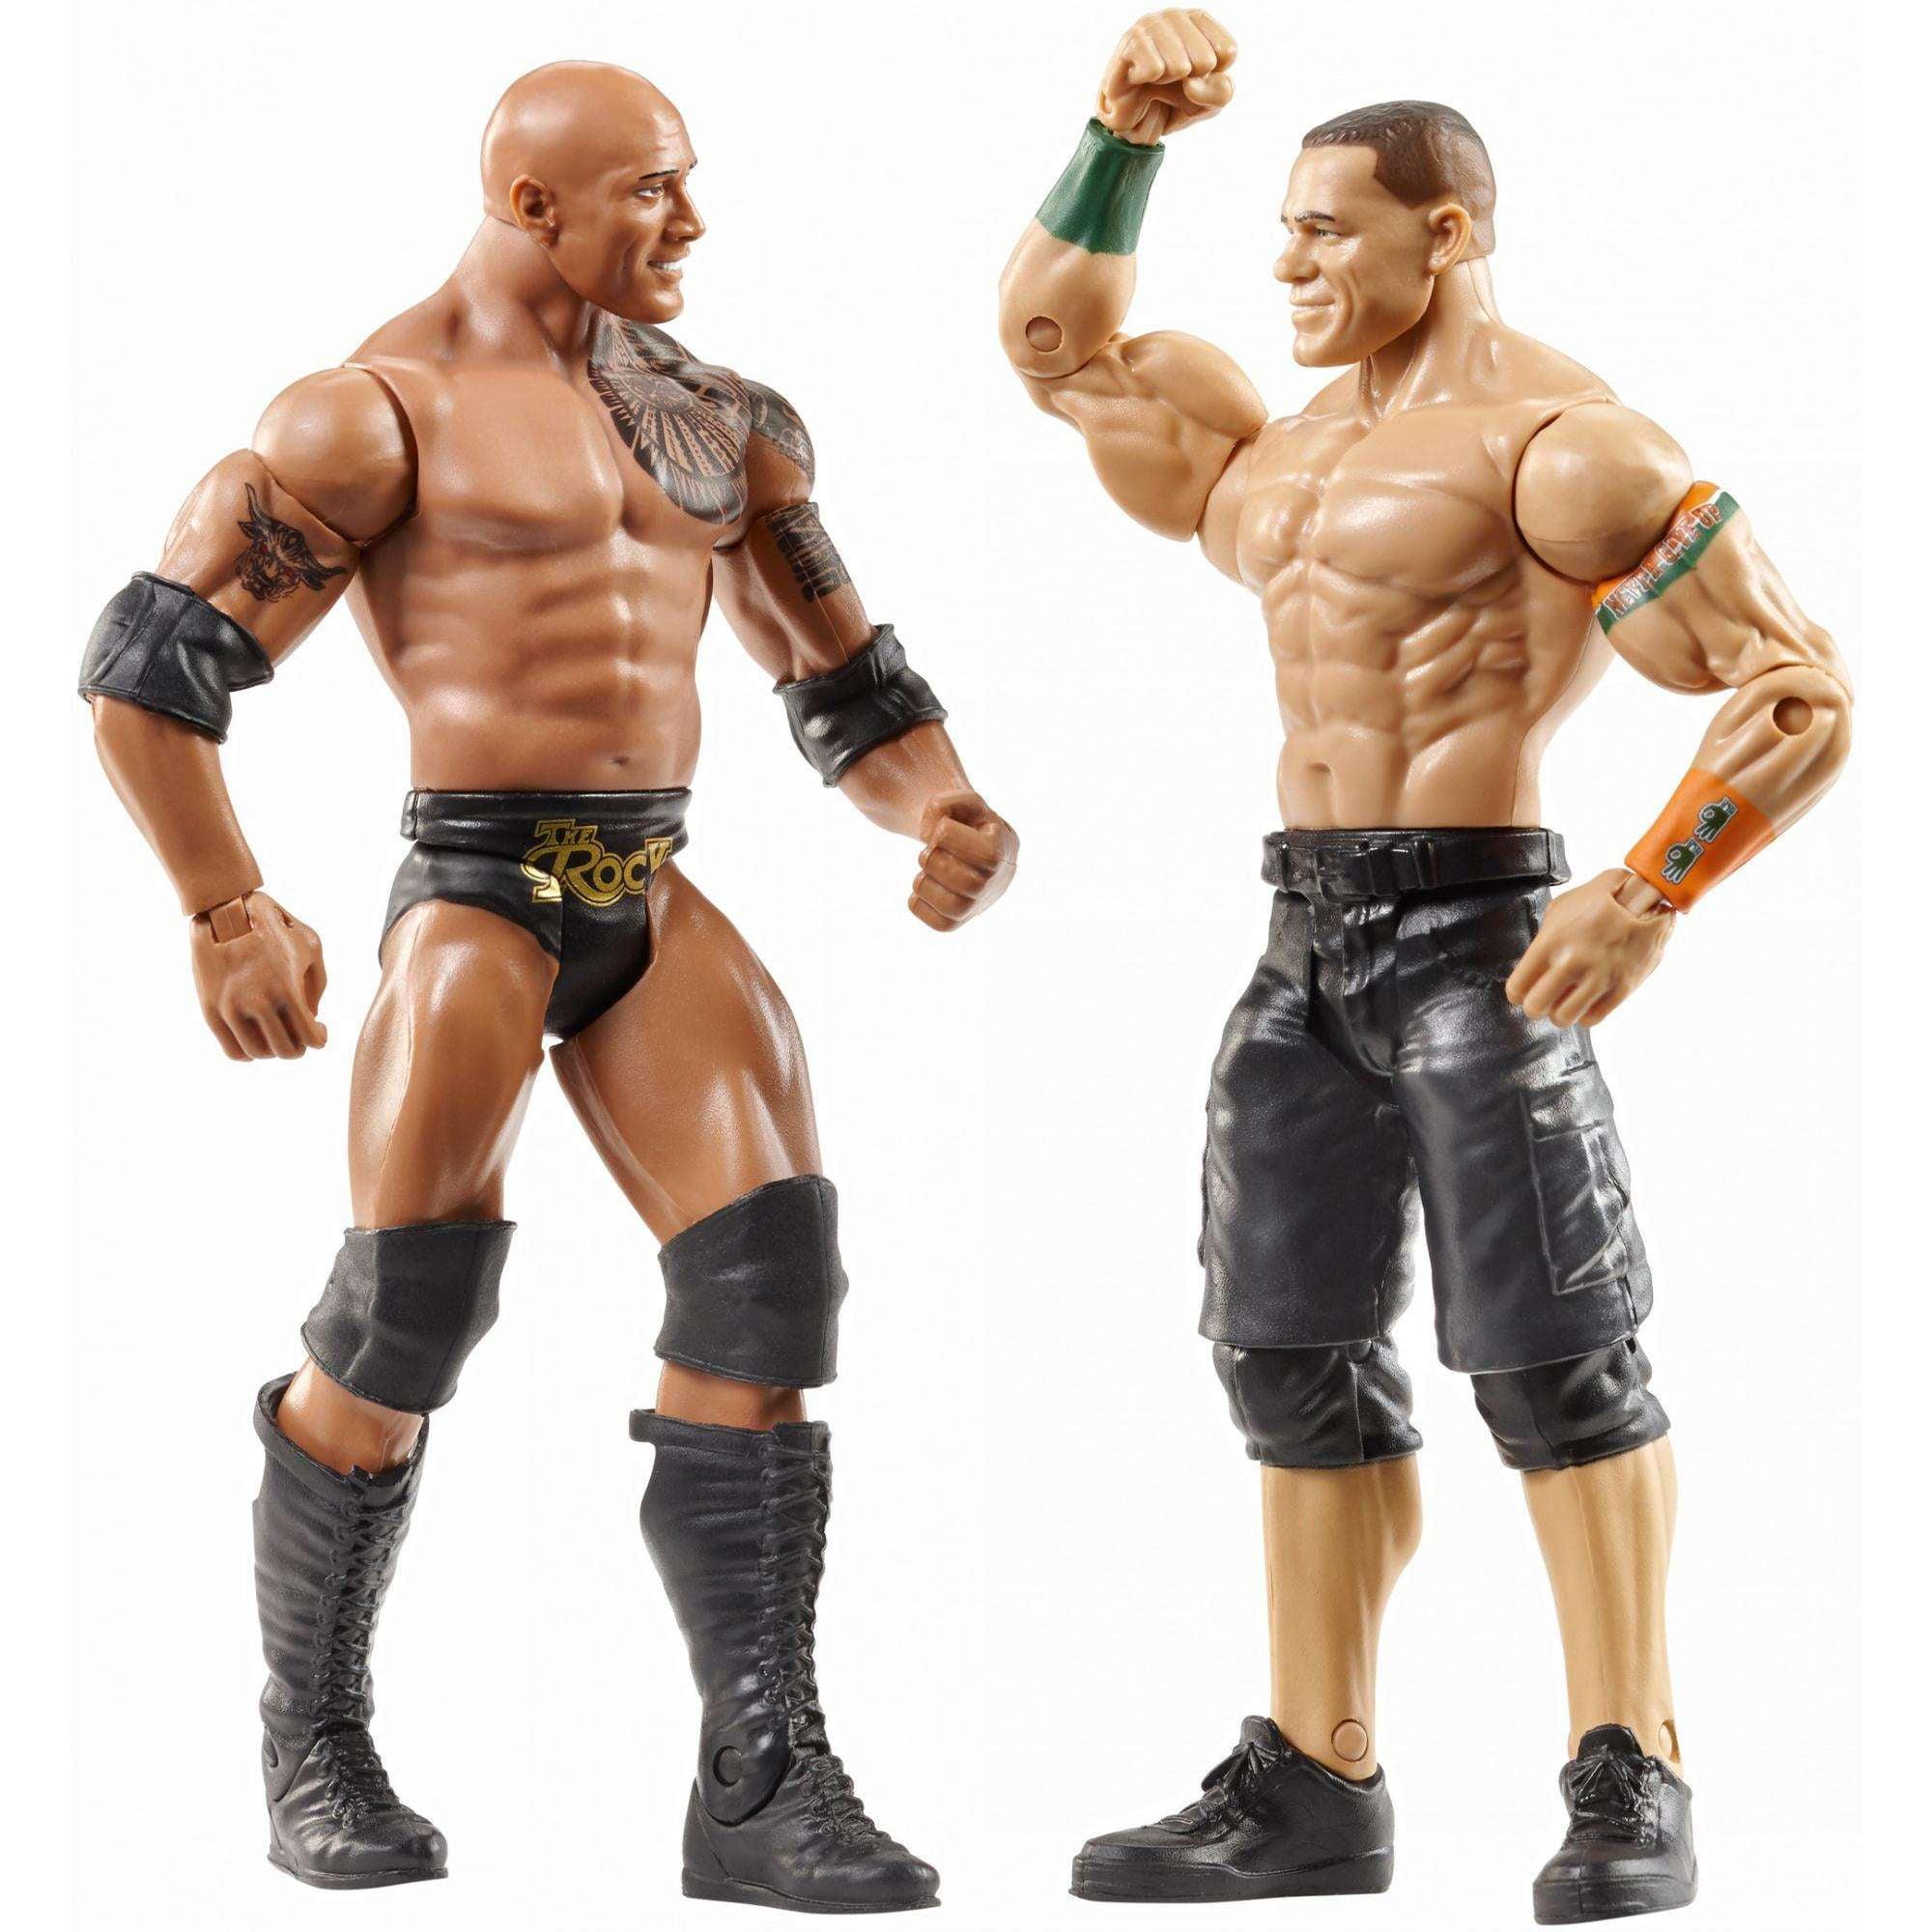 Lot of two WWE minifigures The Rock /& John Cena